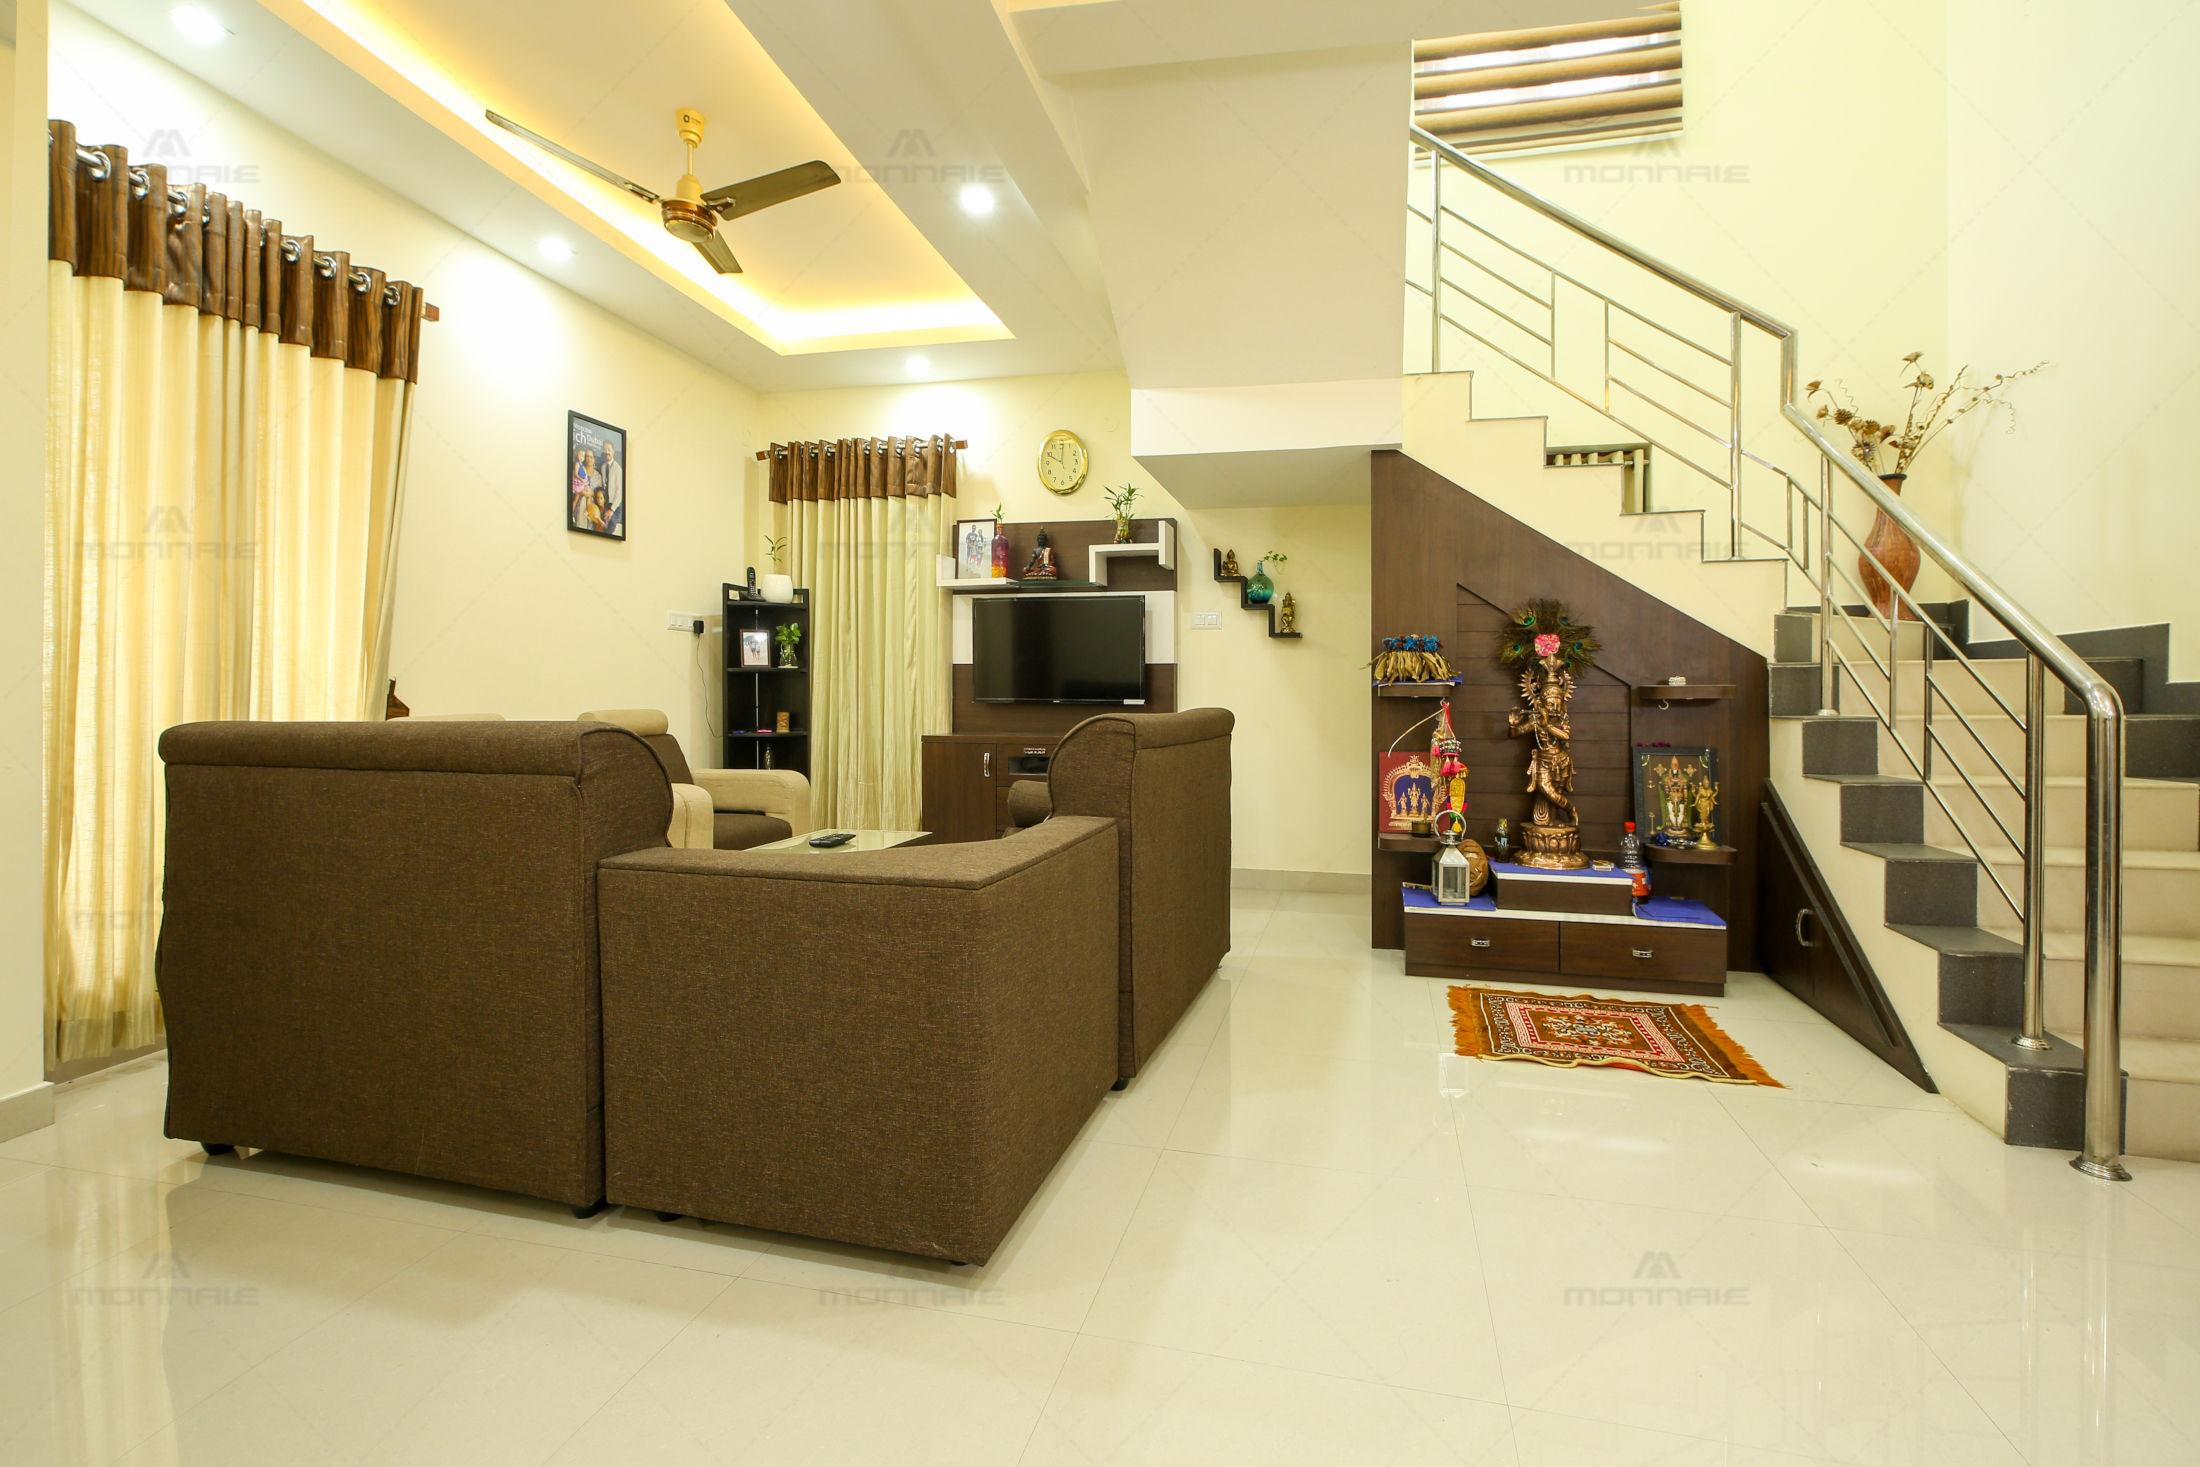 Minimalistic Home Interior Designers Kochi Kerala Monnaie Architects Interiors Medios De Comunicacion Fotos Y Videos 2 Archello